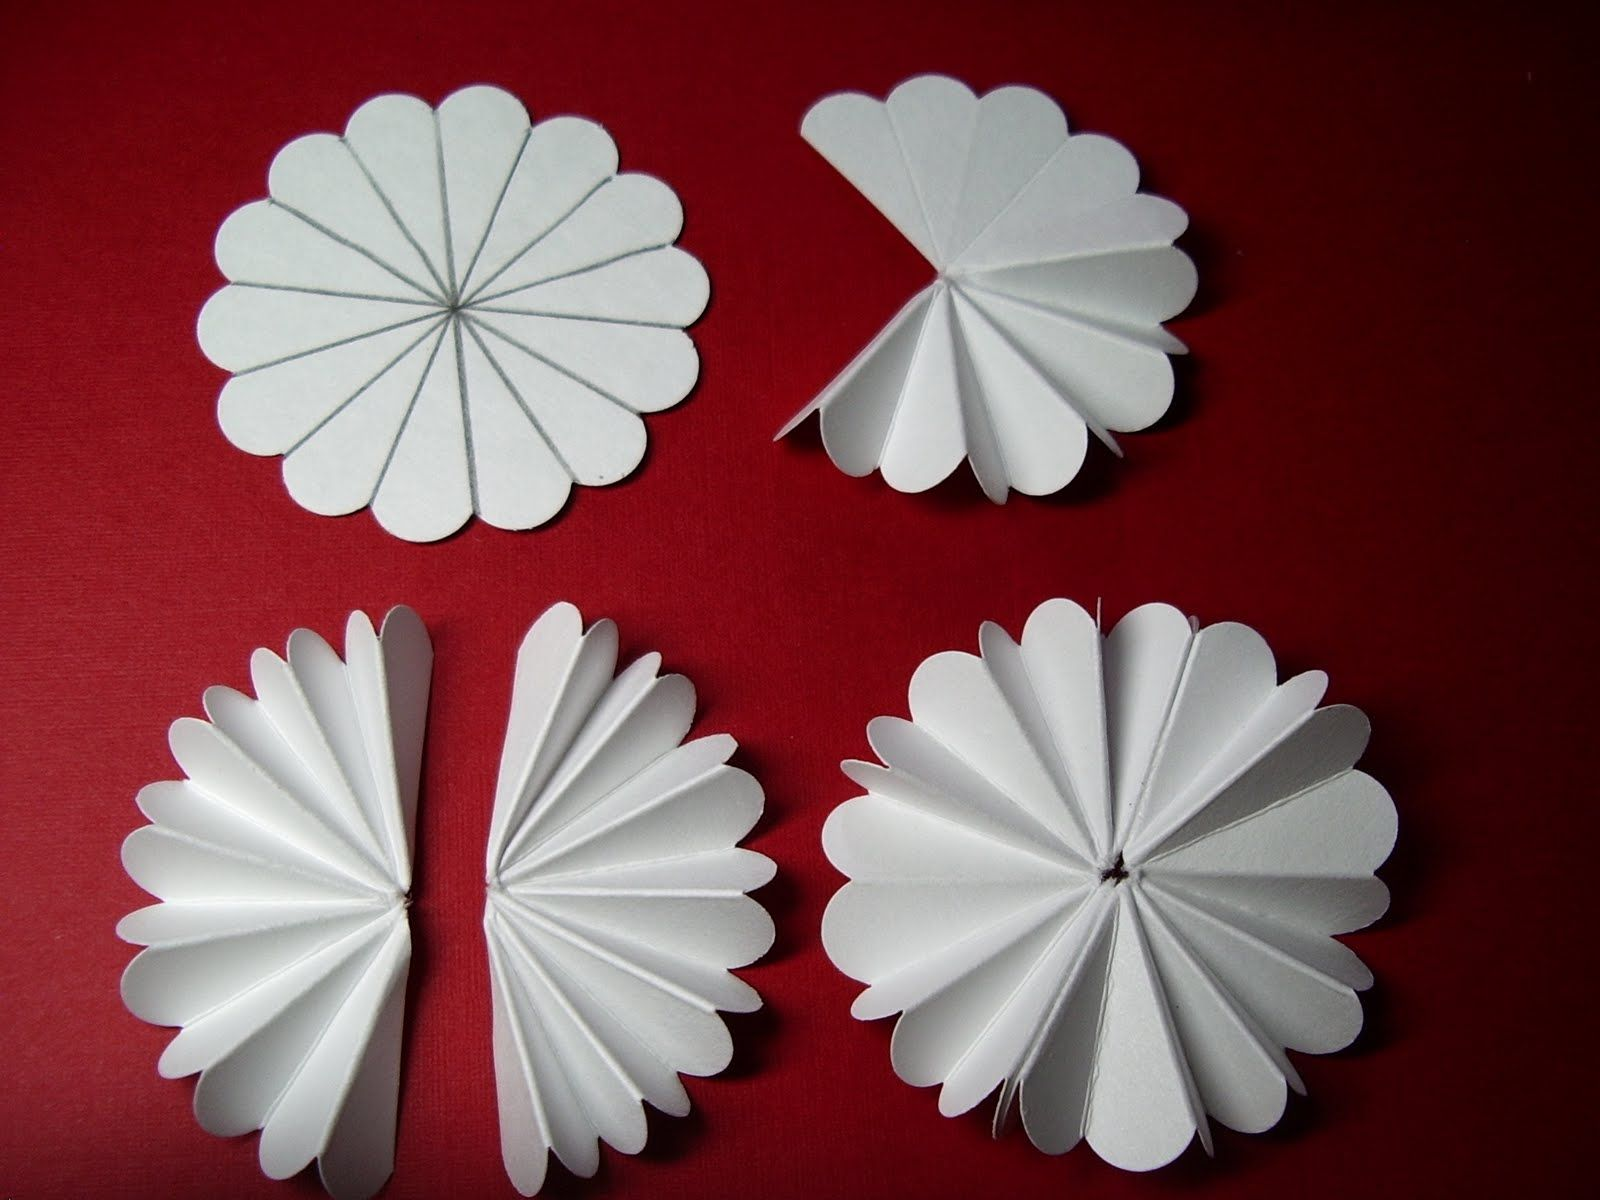 Accordion paper folding recherche google scrapbook paper crafts accordion paper folding recherche google mightylinksfo